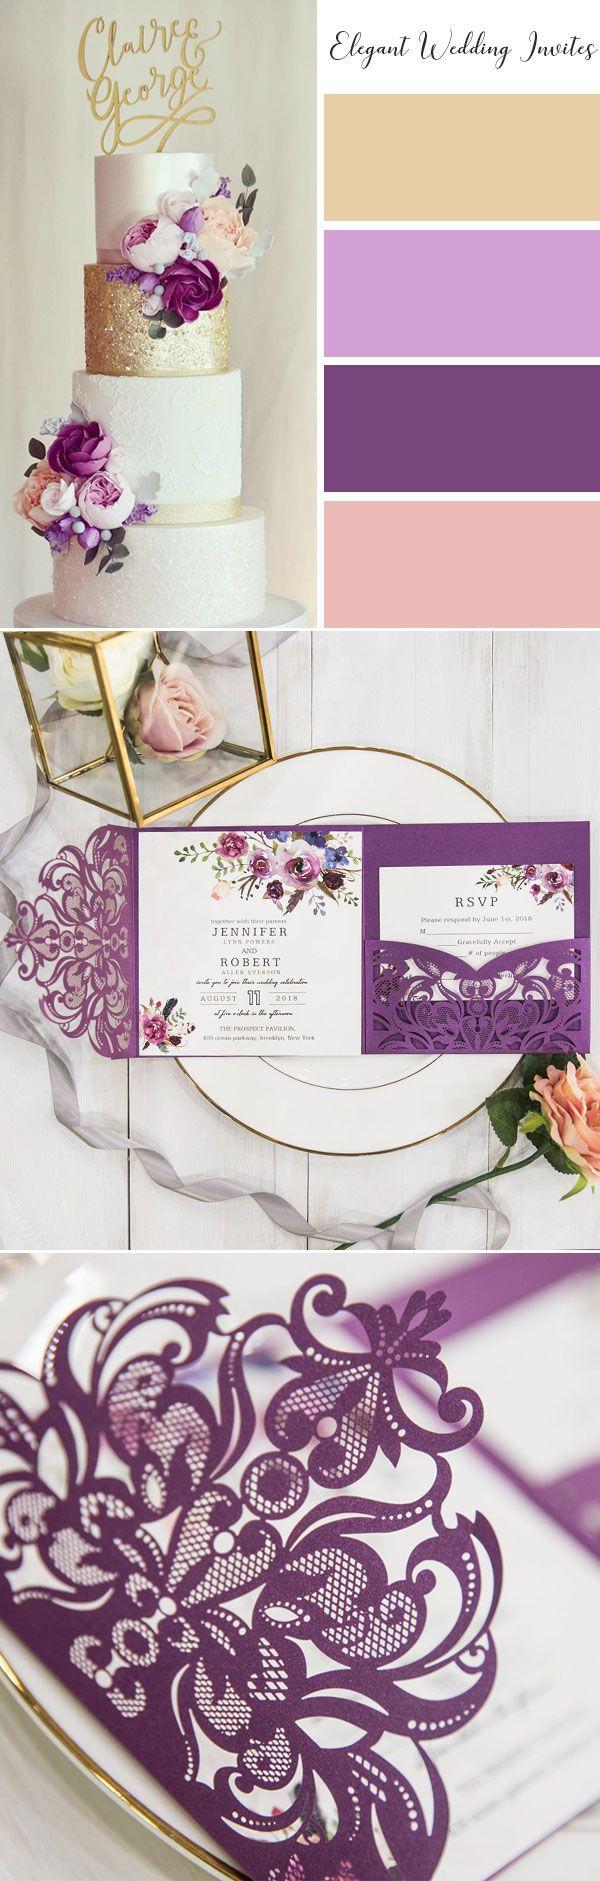 141 Best Purple Wedding Colors Images By Elegantweddinginvites On